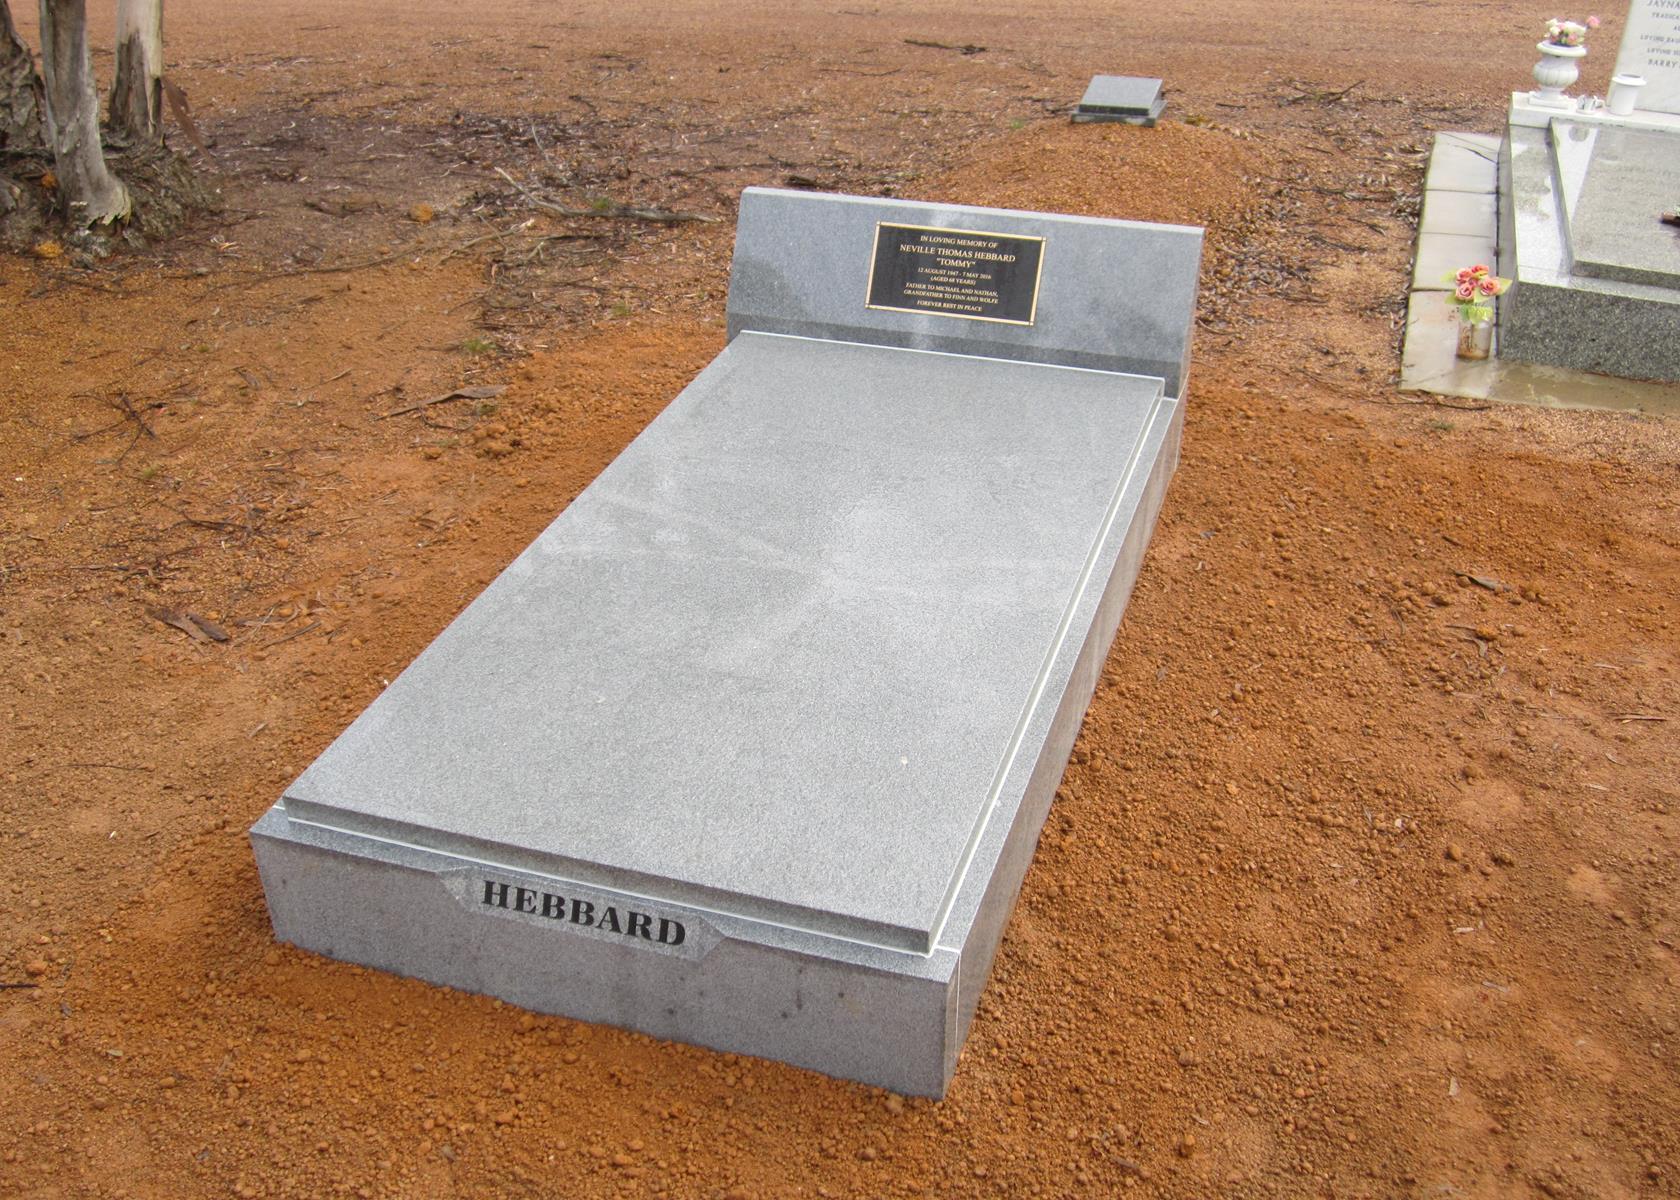 Hebbard